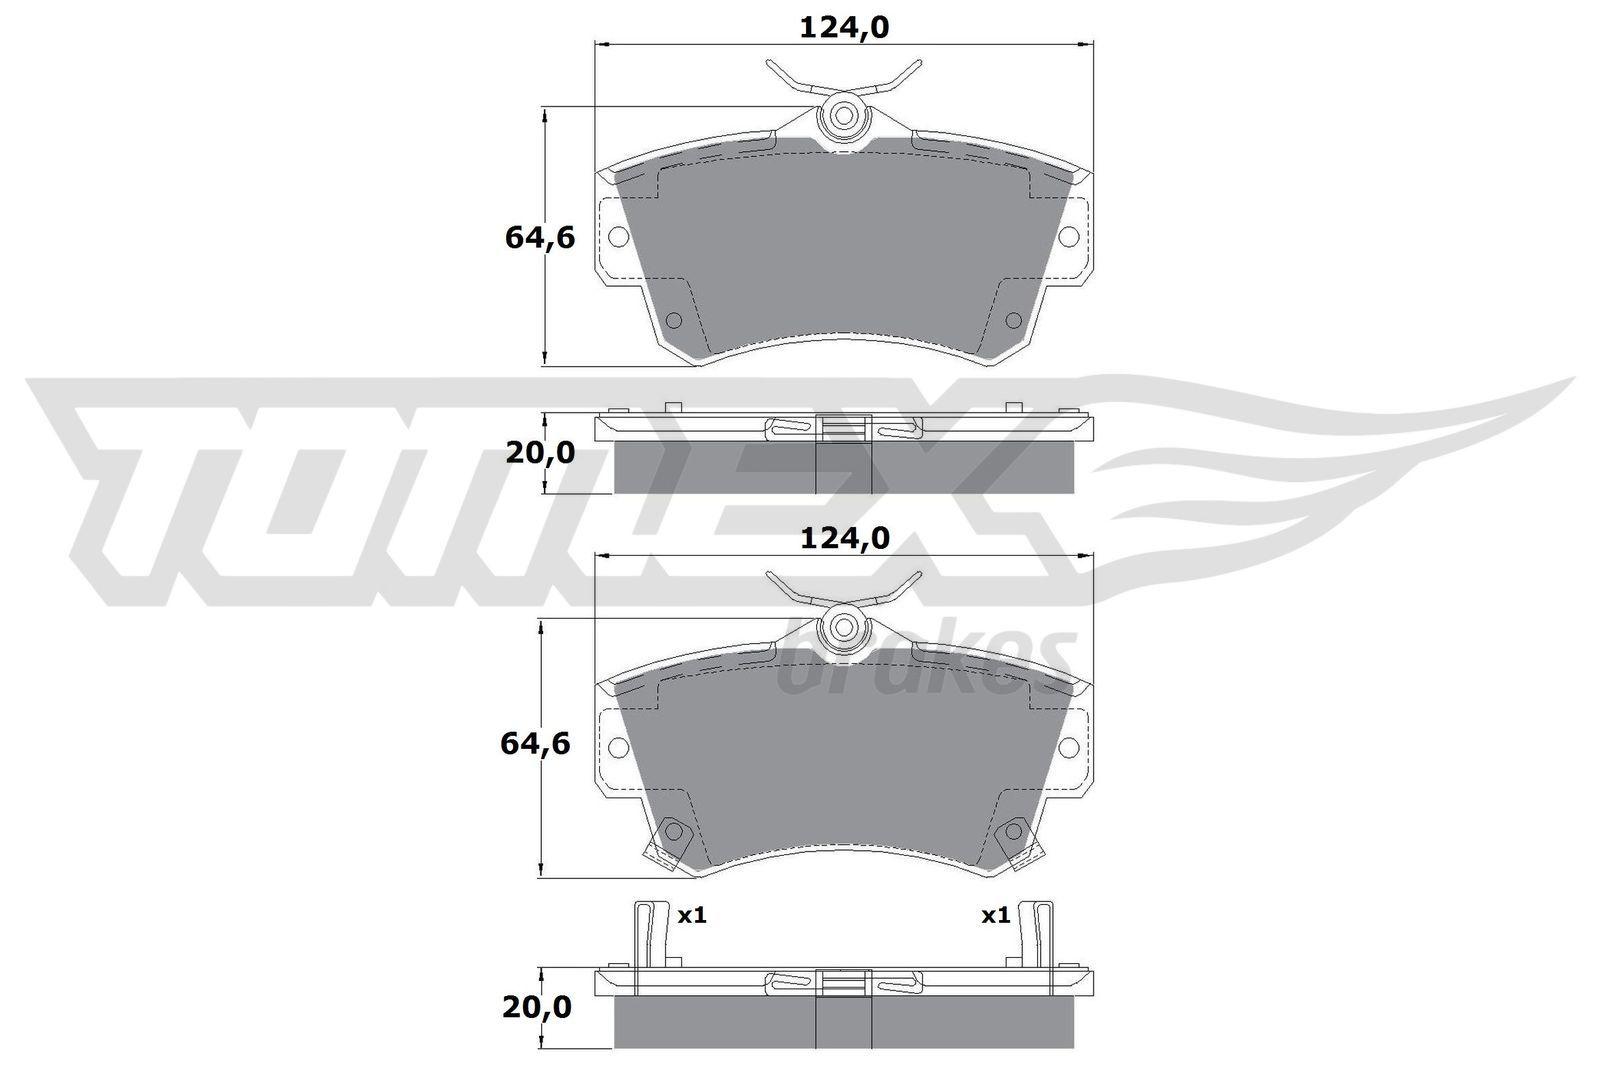 CHRYSLER PT CRUISER 2003 Bremsbelagsatz - Original TOMEX brakes TX 14-97 Höhe: 64,6mm, Breite: 124mm, Dicke/Stärke: 20mm